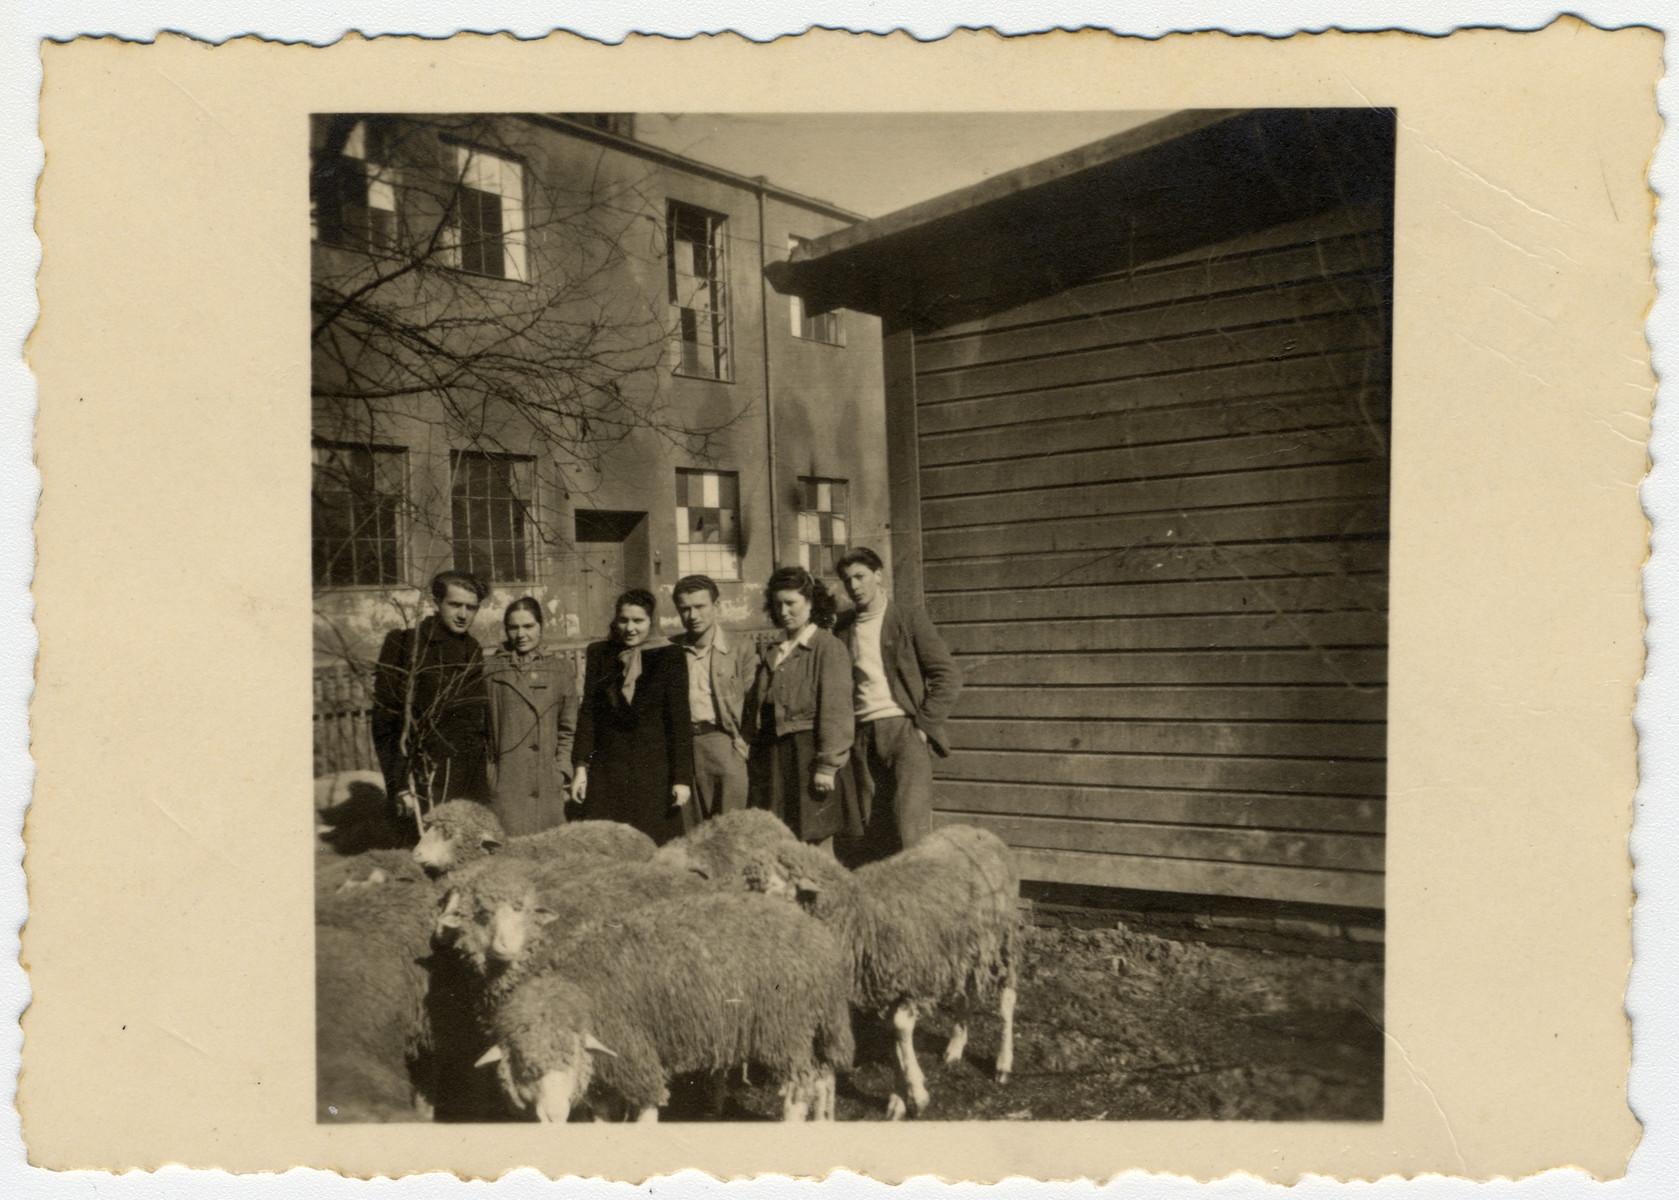 Members of a kibbutz hachshara pose behind a herd of sheep in the Eschwege displaced persons' camp.